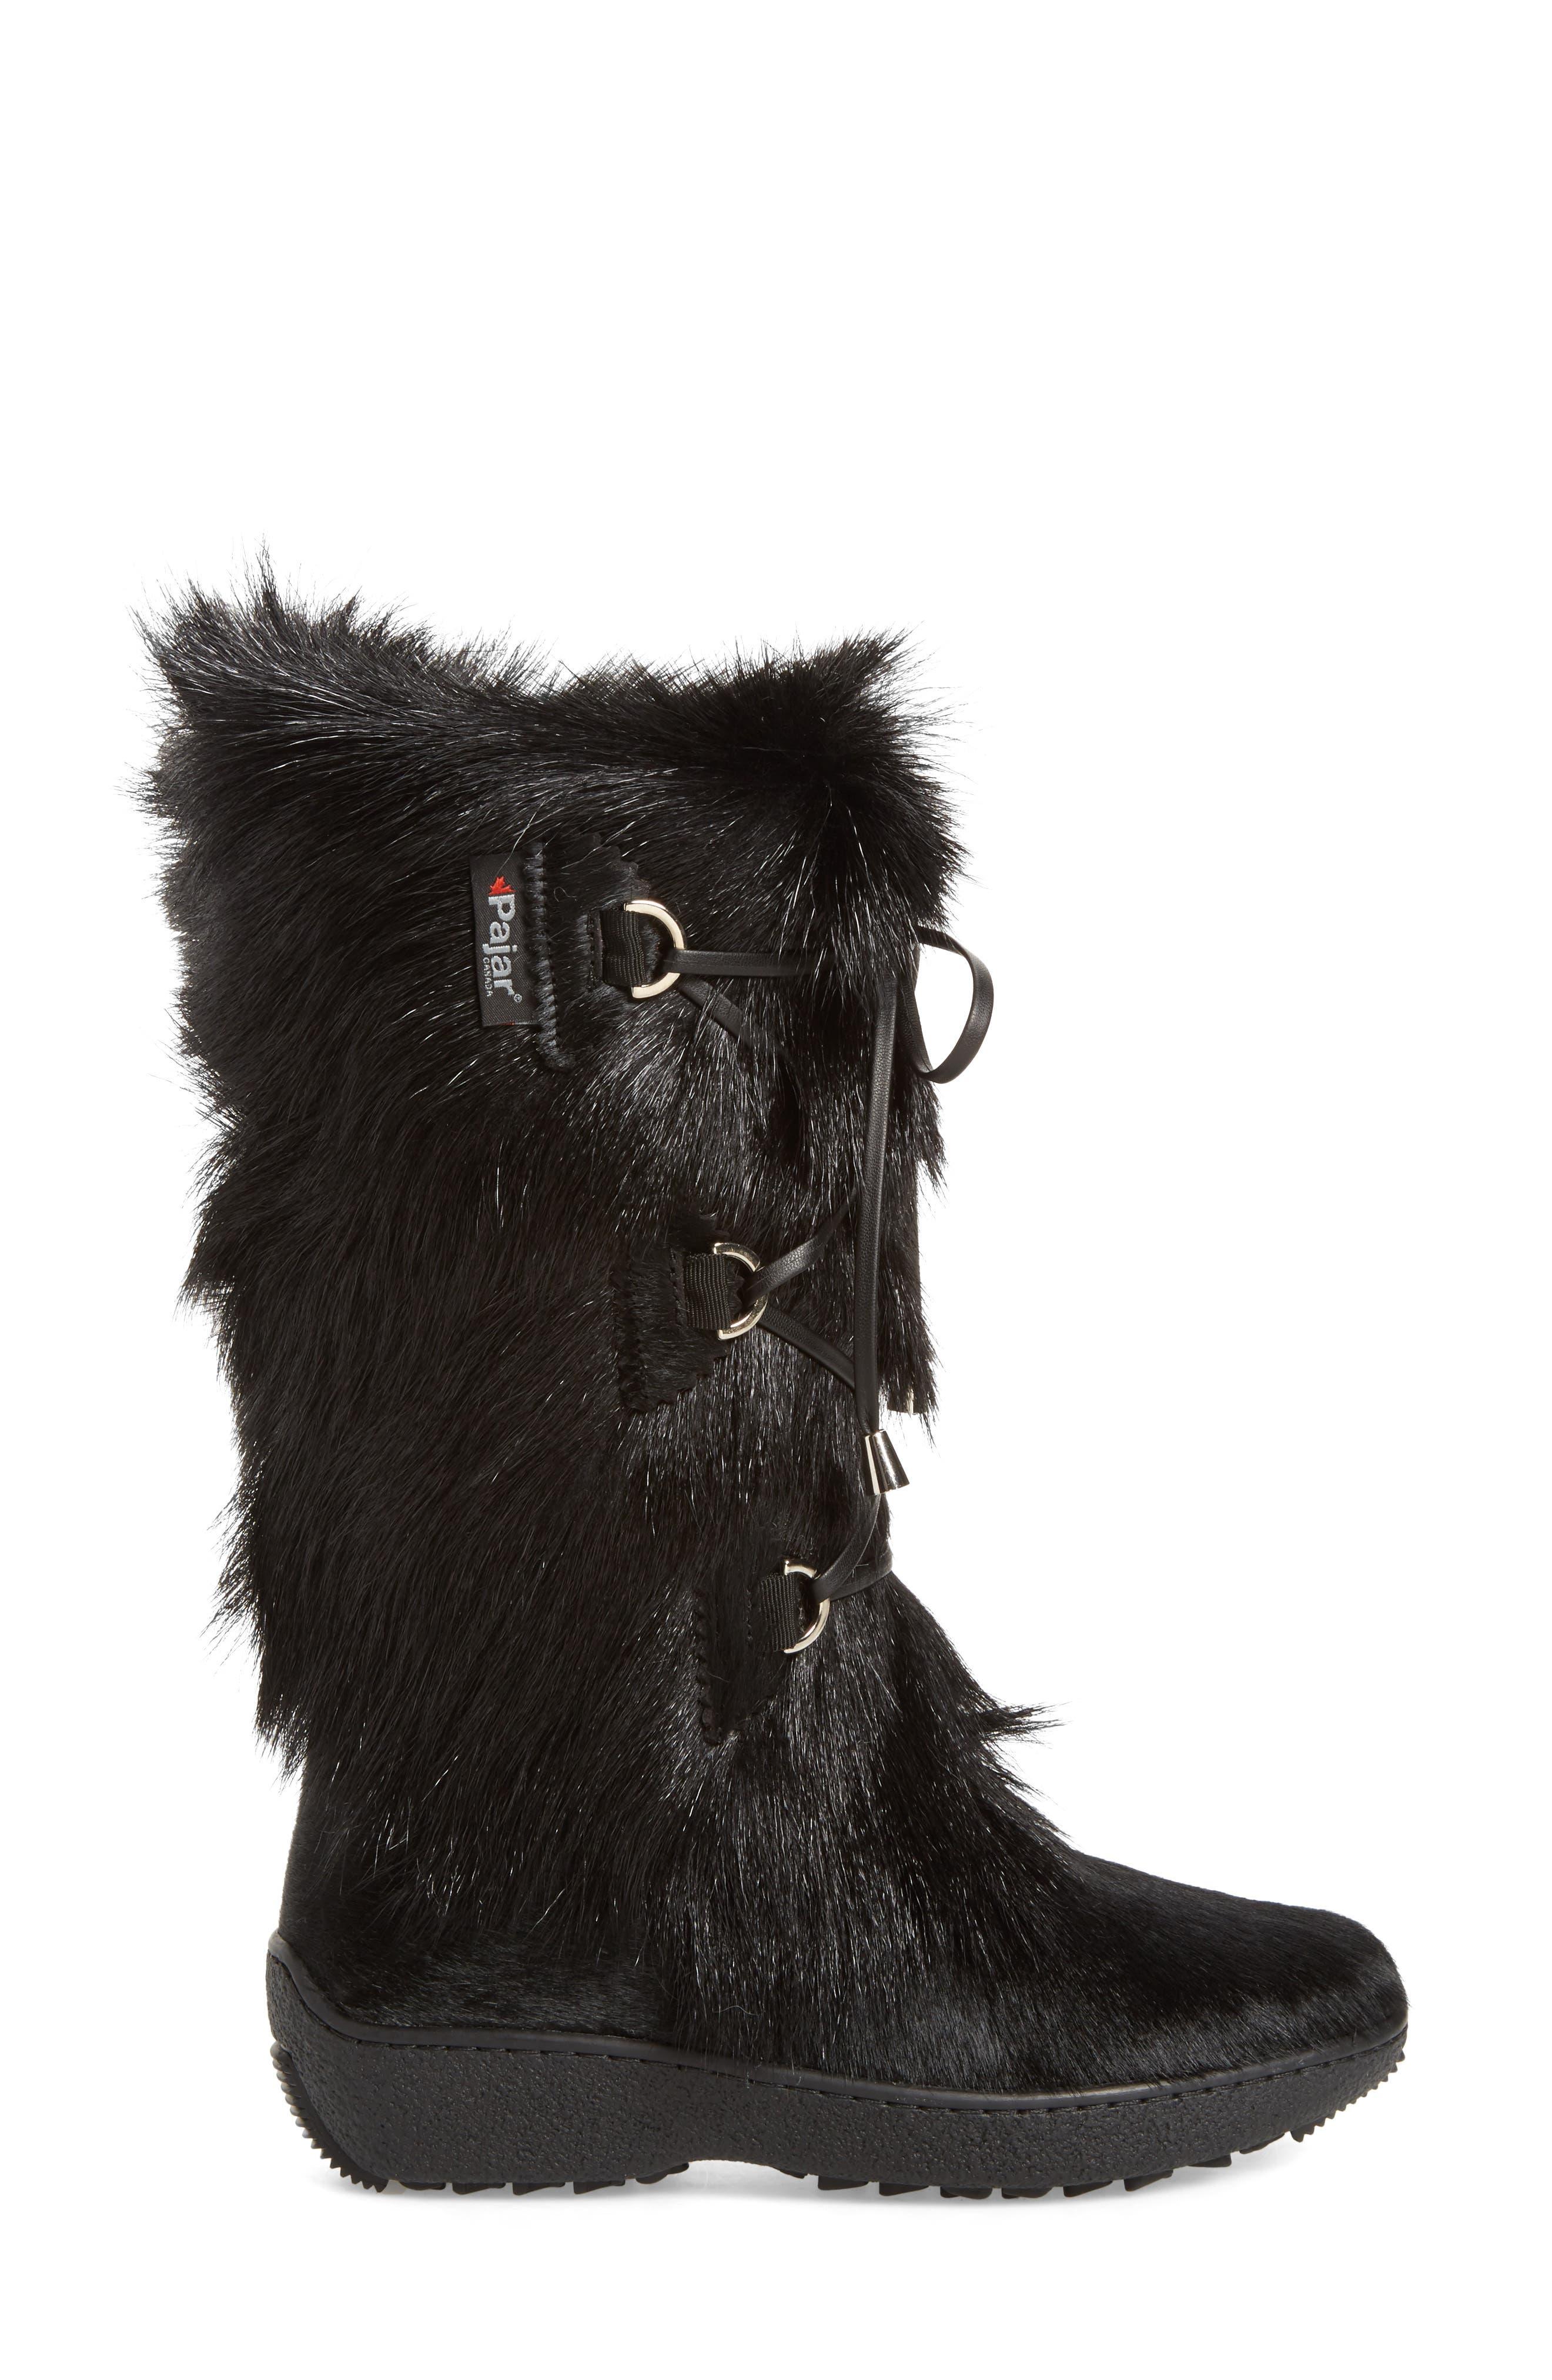 Davos Genuine Goat Fur Boot,                             Alternate thumbnail 3, color,                             001